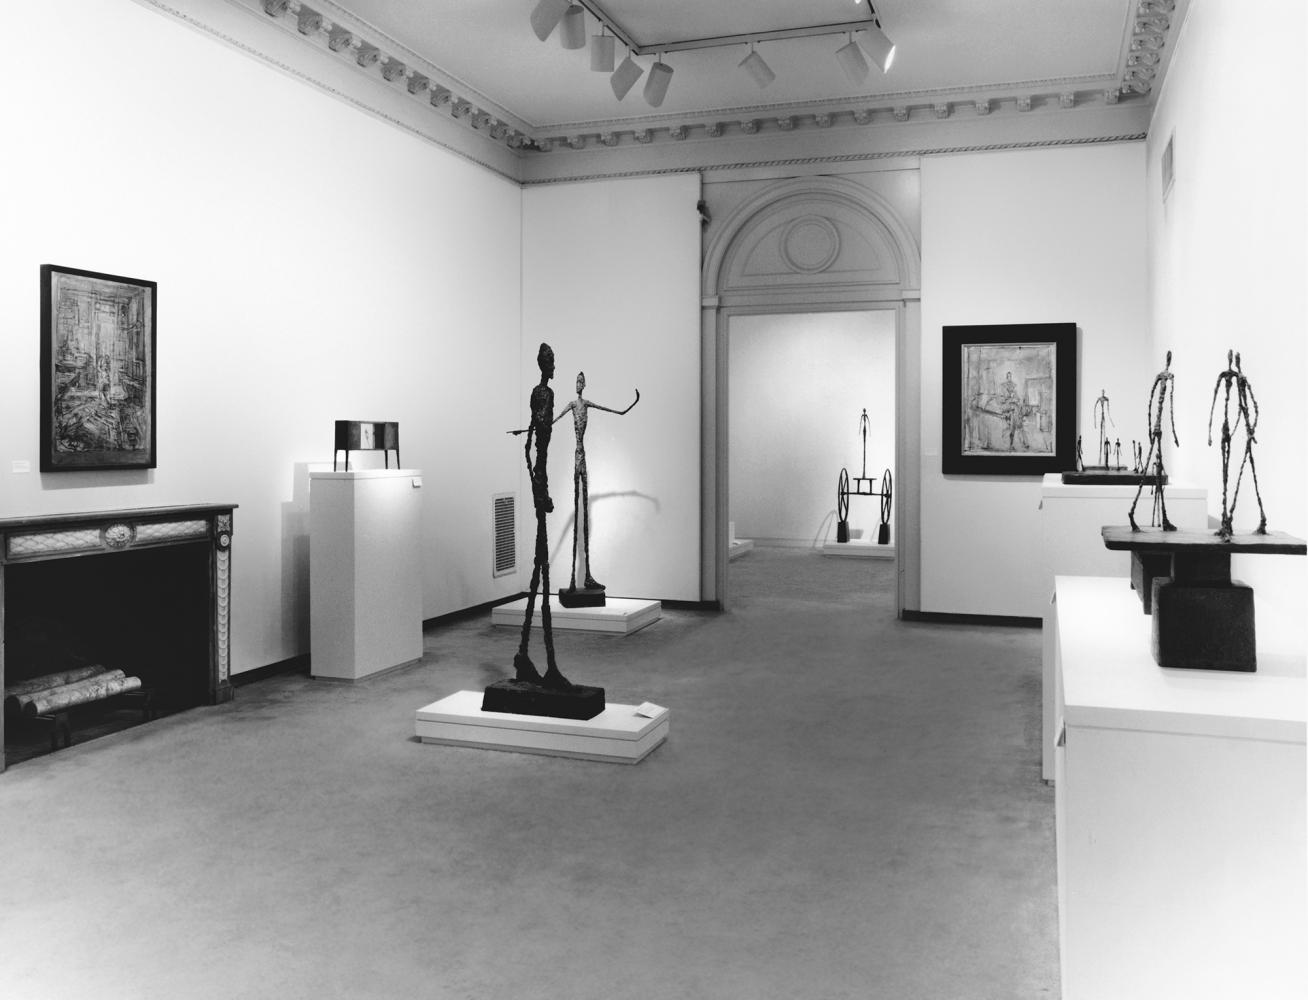 Instllation view of Alberto Giacometti exhibition, fall 1994. Art © Alberto Giacometti Estate / Licensed by VAGA and ARS, New York, NY.